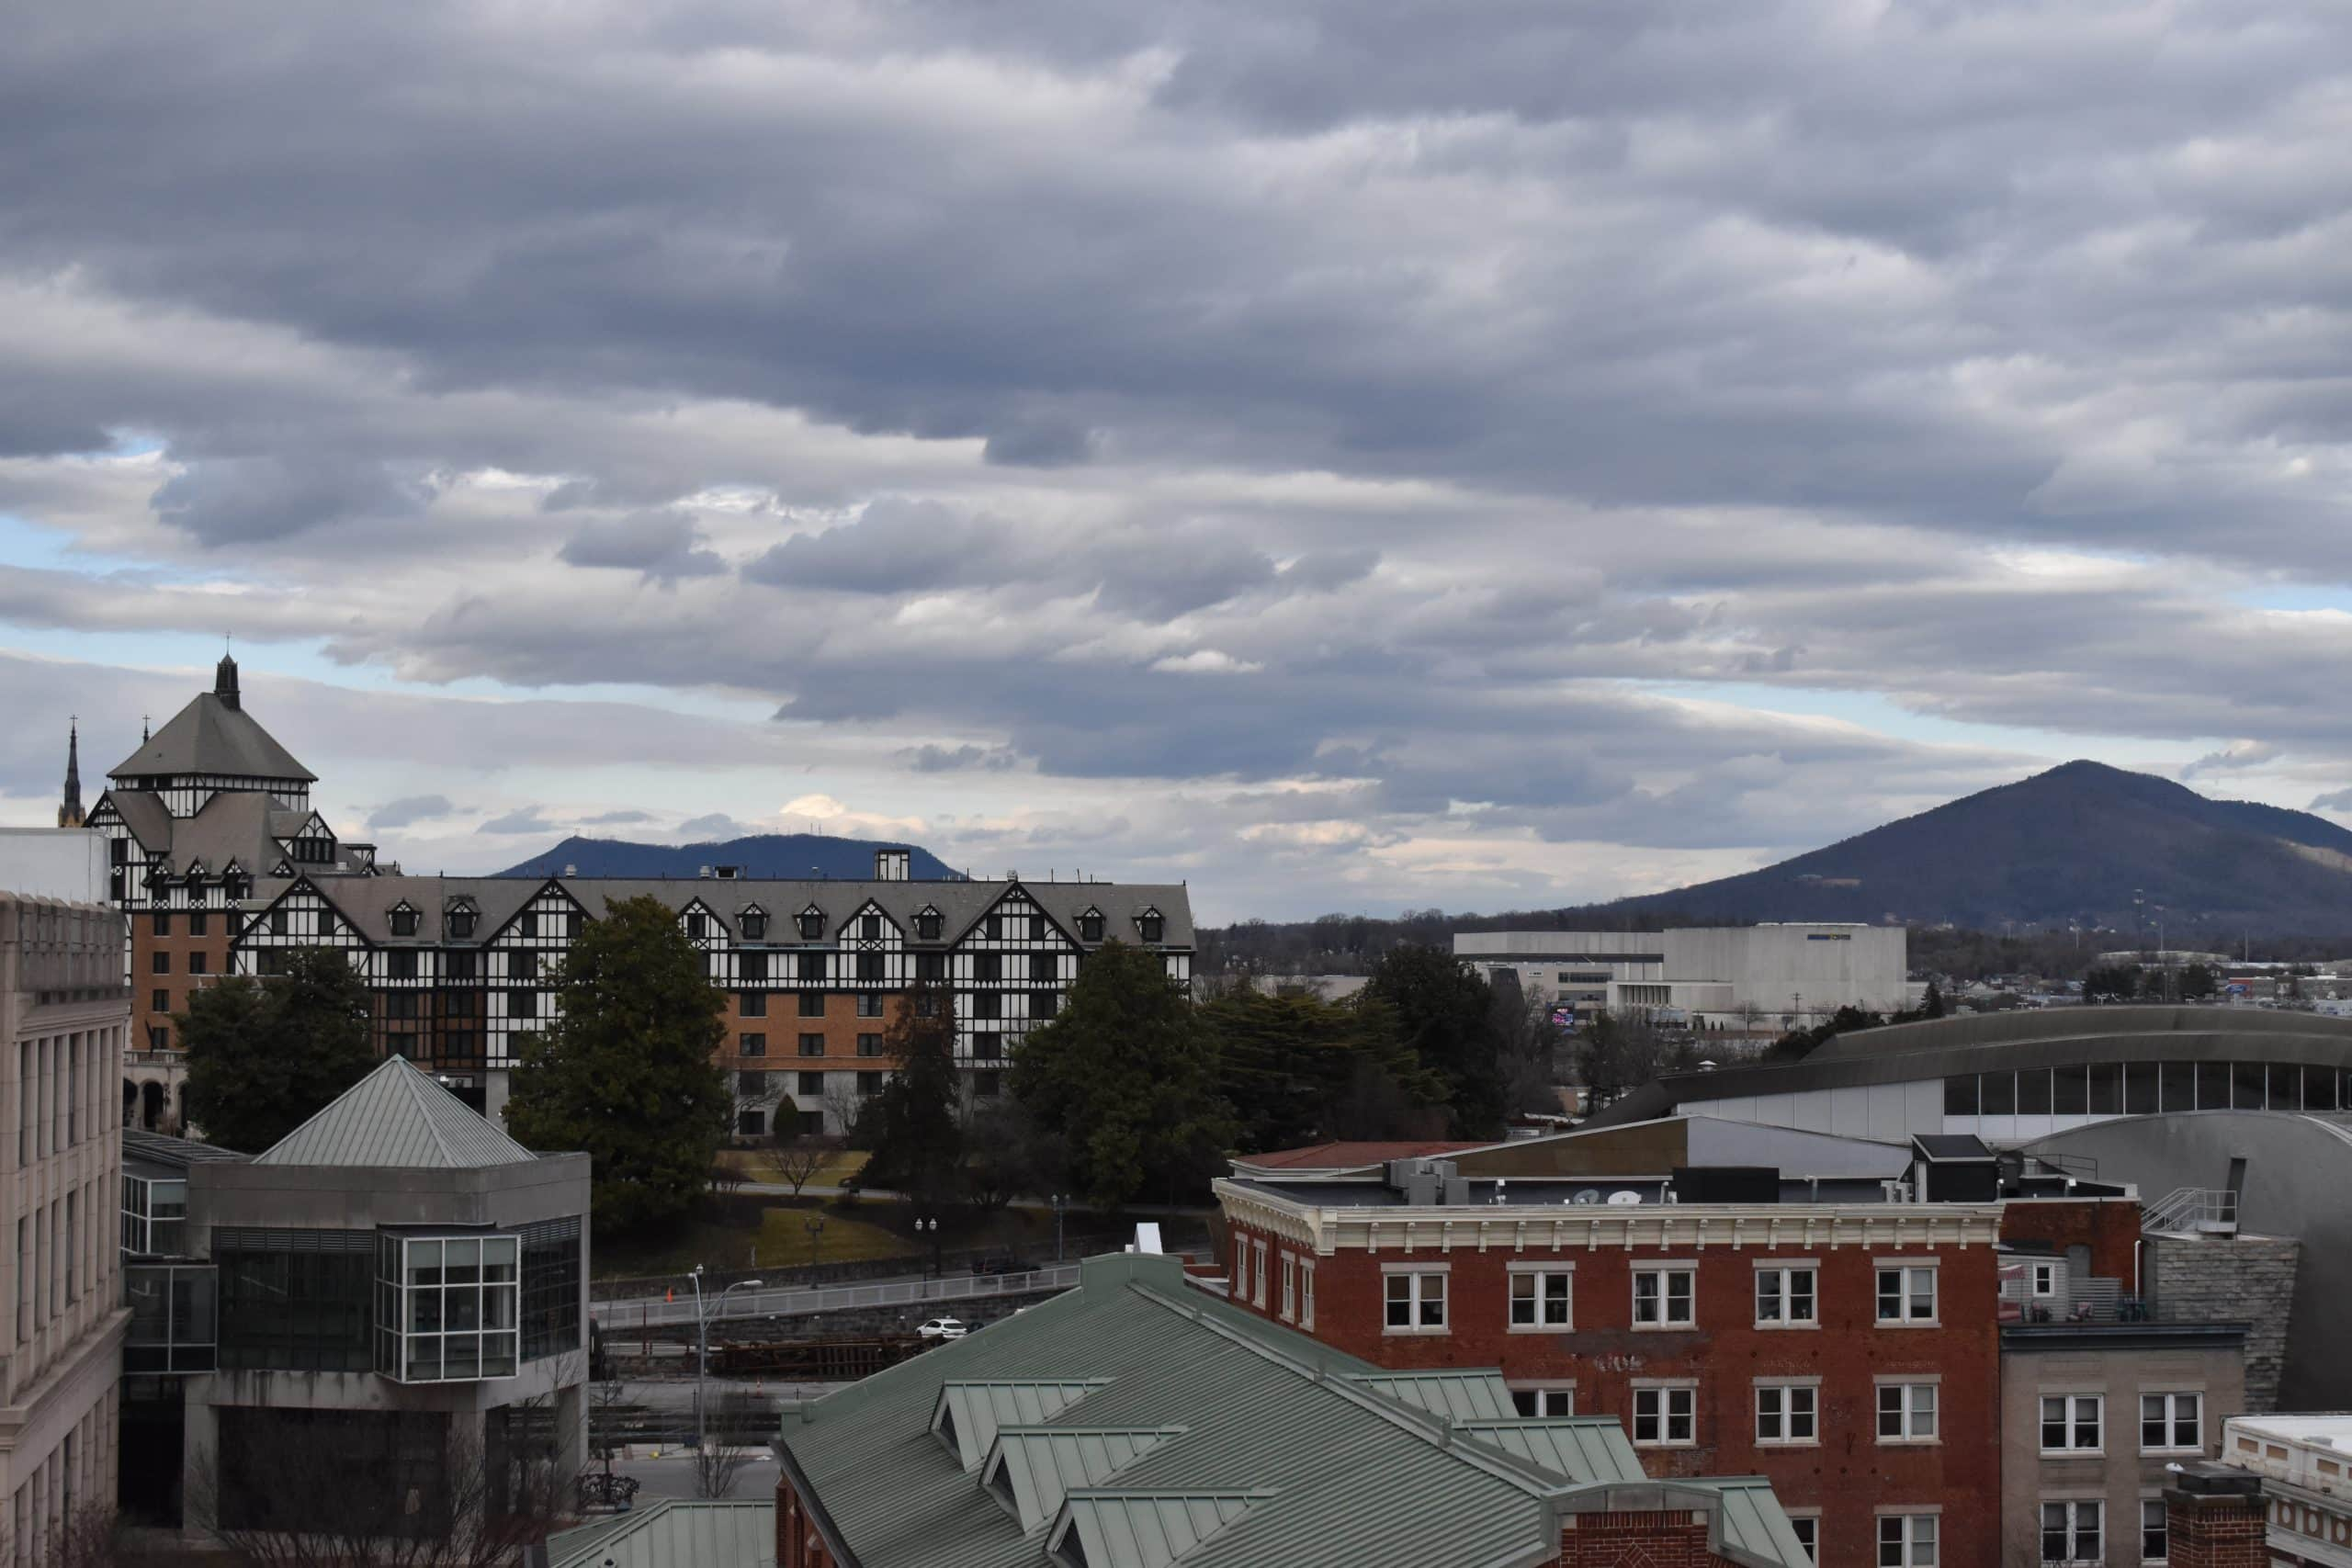 Downtown Roanoke Hotel Read Mountain scaled